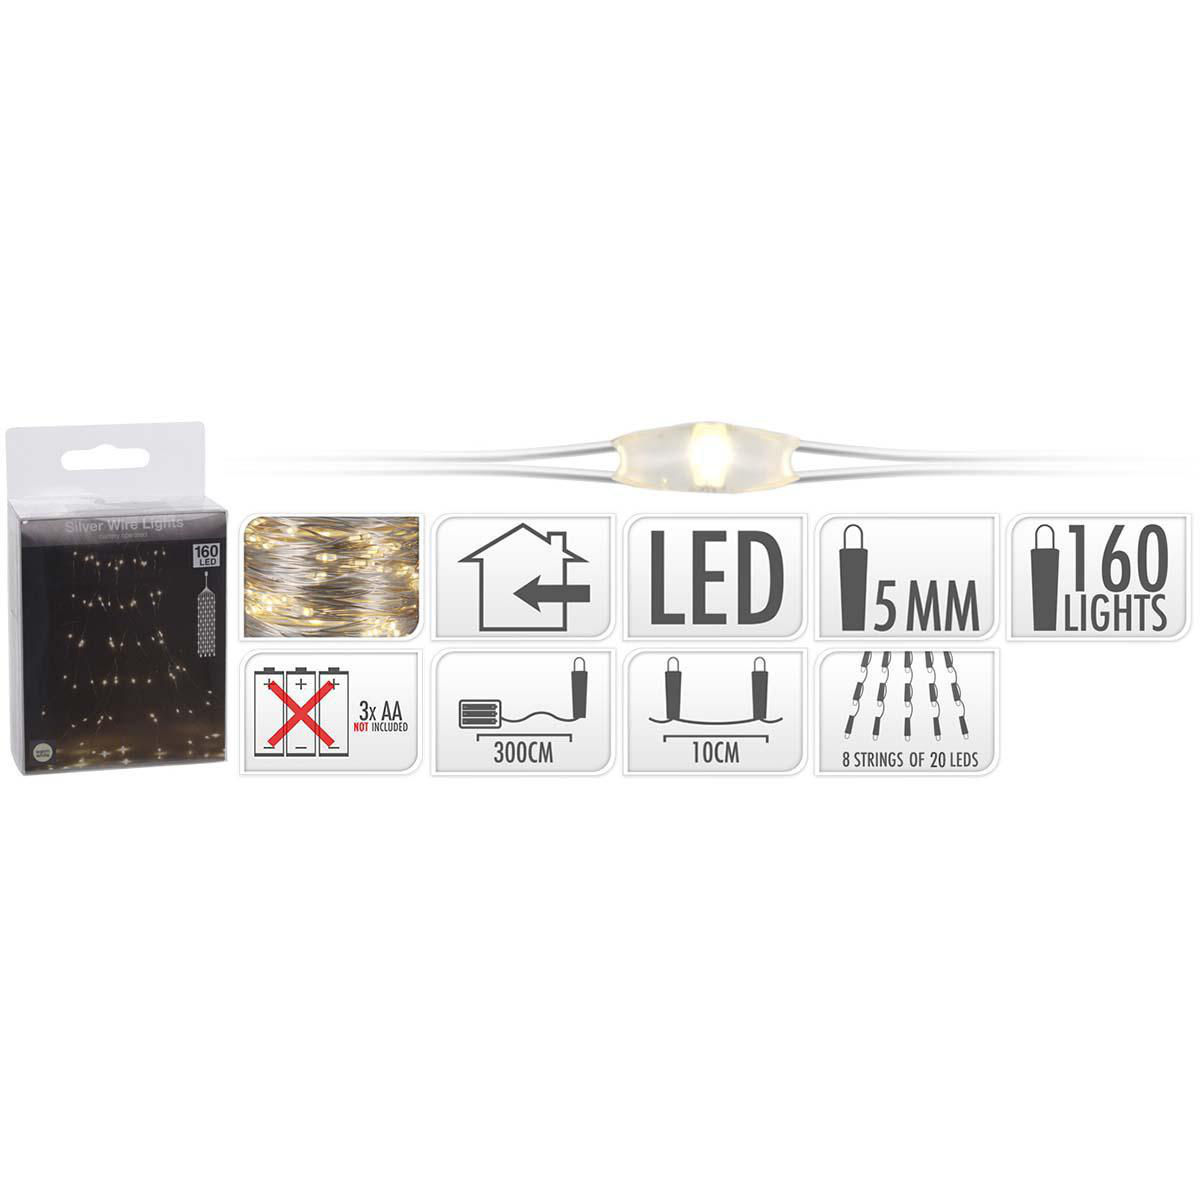 silberdraht-beleuchtung-160led